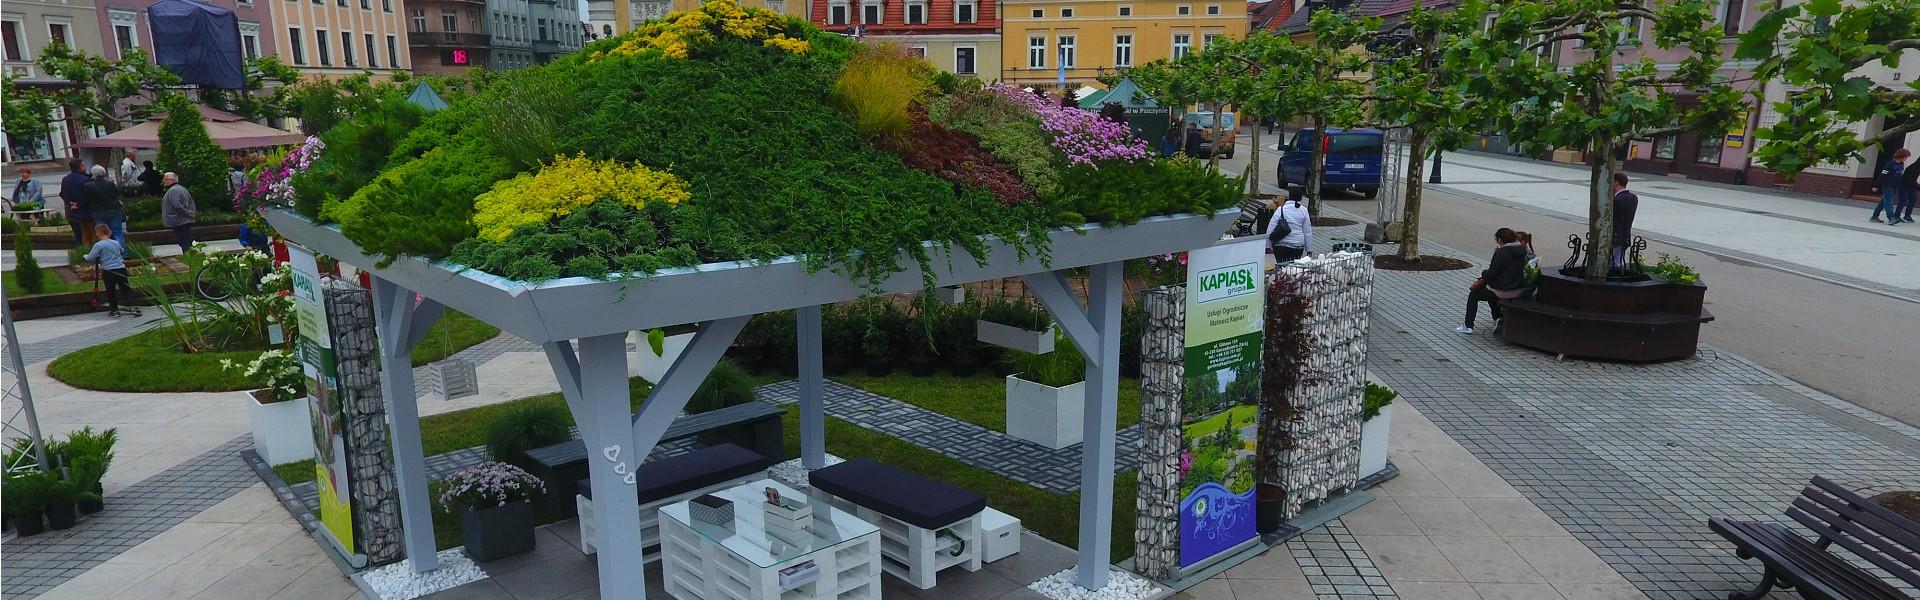 zielona altana